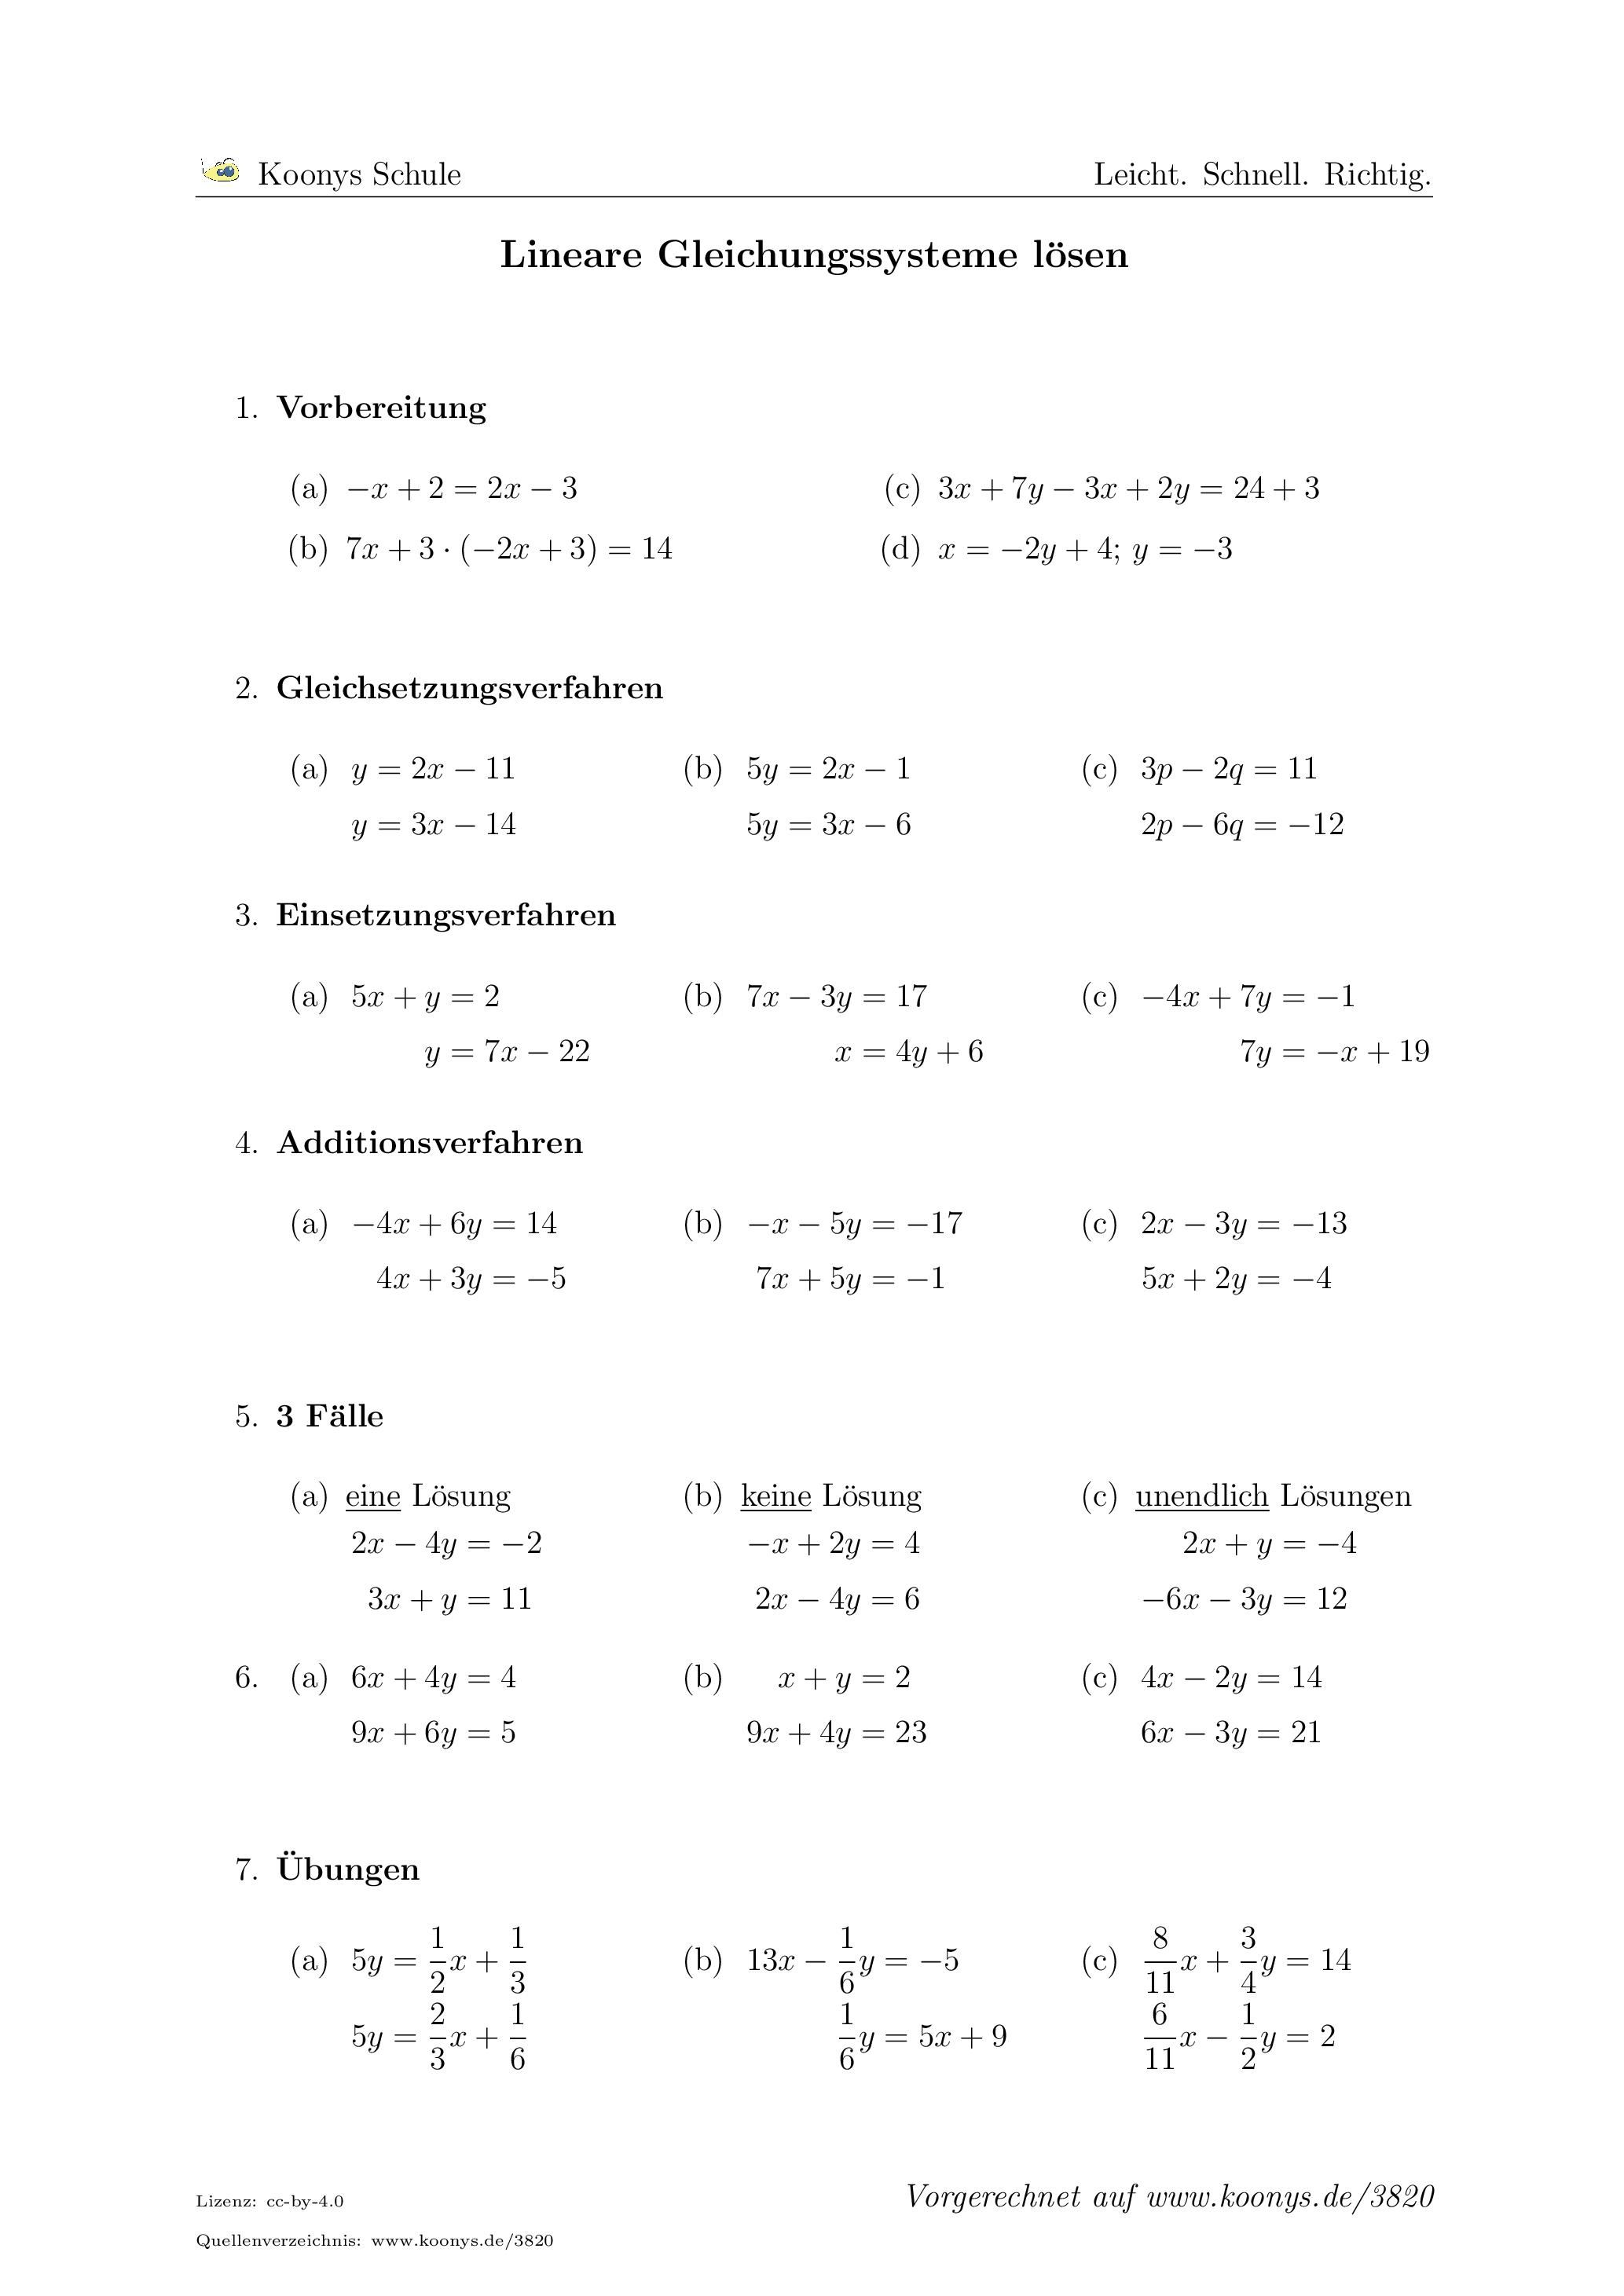 Lineare Gleichungssysteme lösen | Arbeitsblatt #3820 | Schule ...